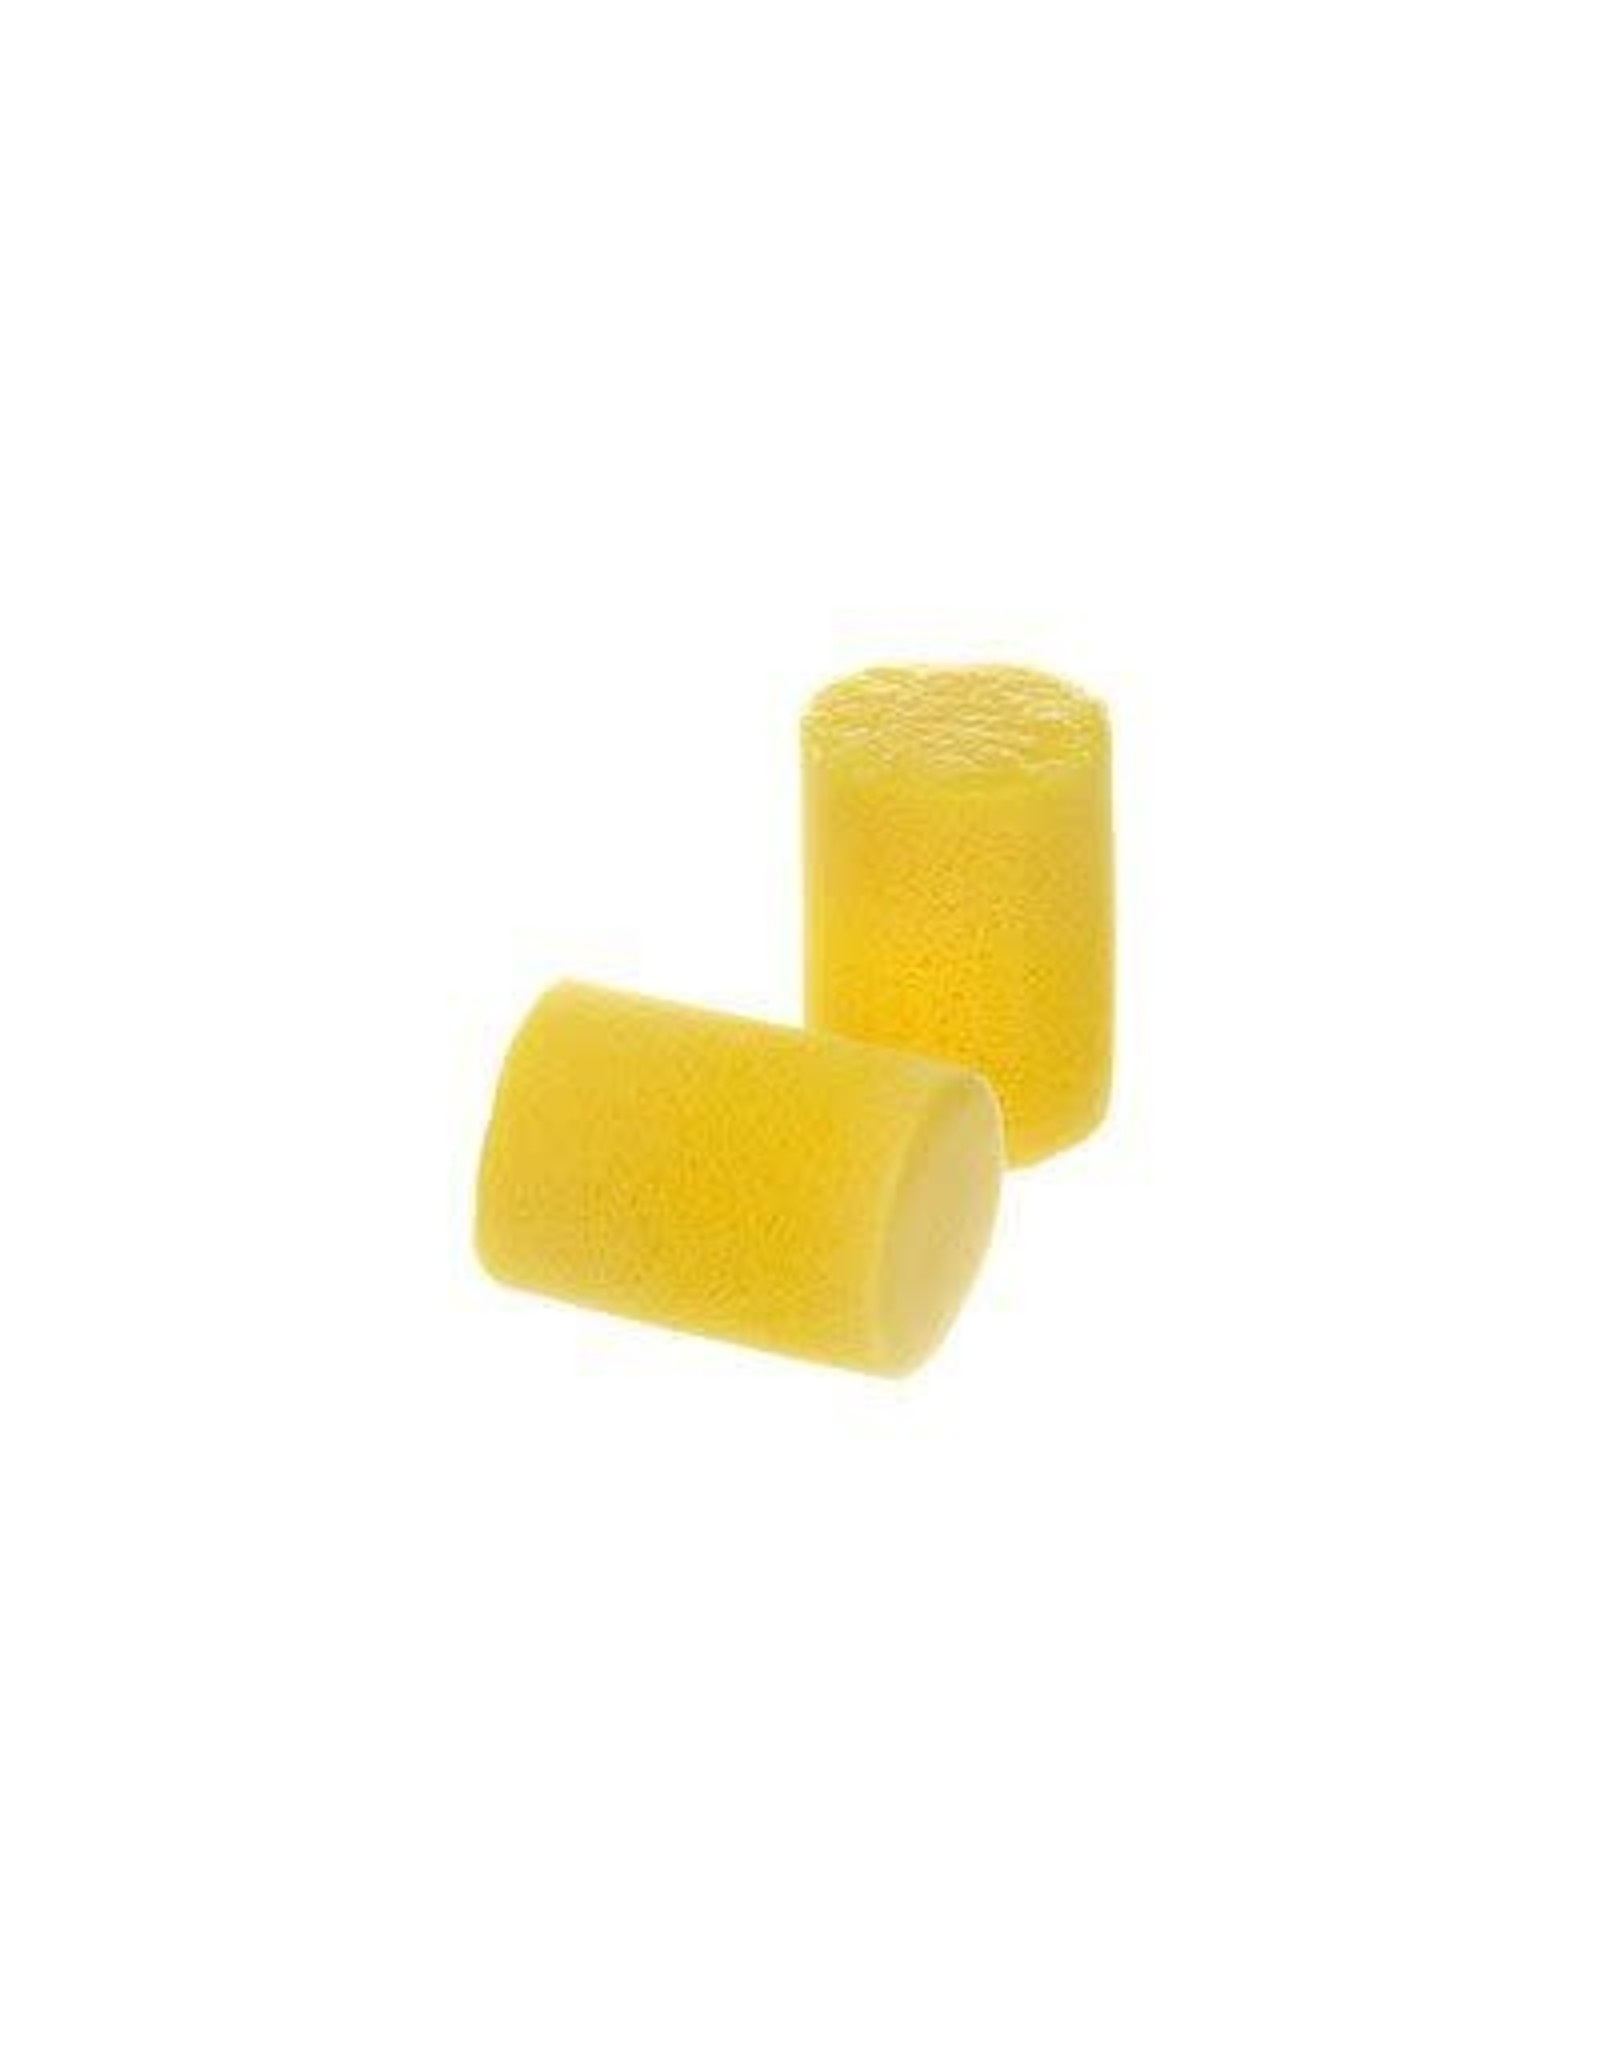 3M™ E-A-R™ Classic Earplugs, Uncorded, 200 pairs/box